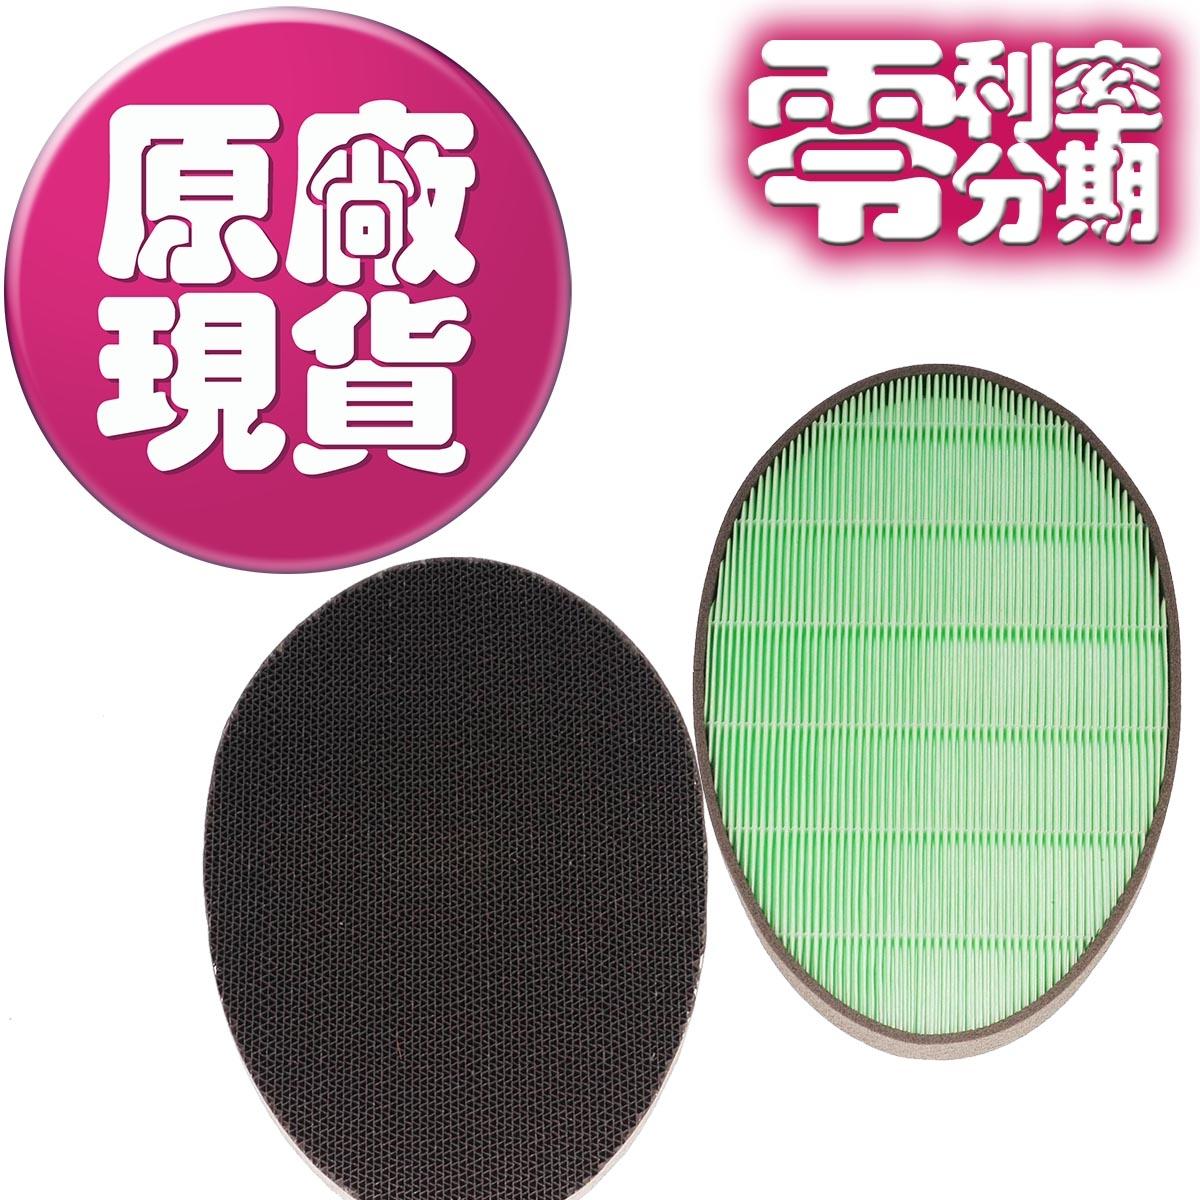 【LG耗材】PS-W309WI 超淨化大白 空氣清淨機 濾網組合包 24期零利率